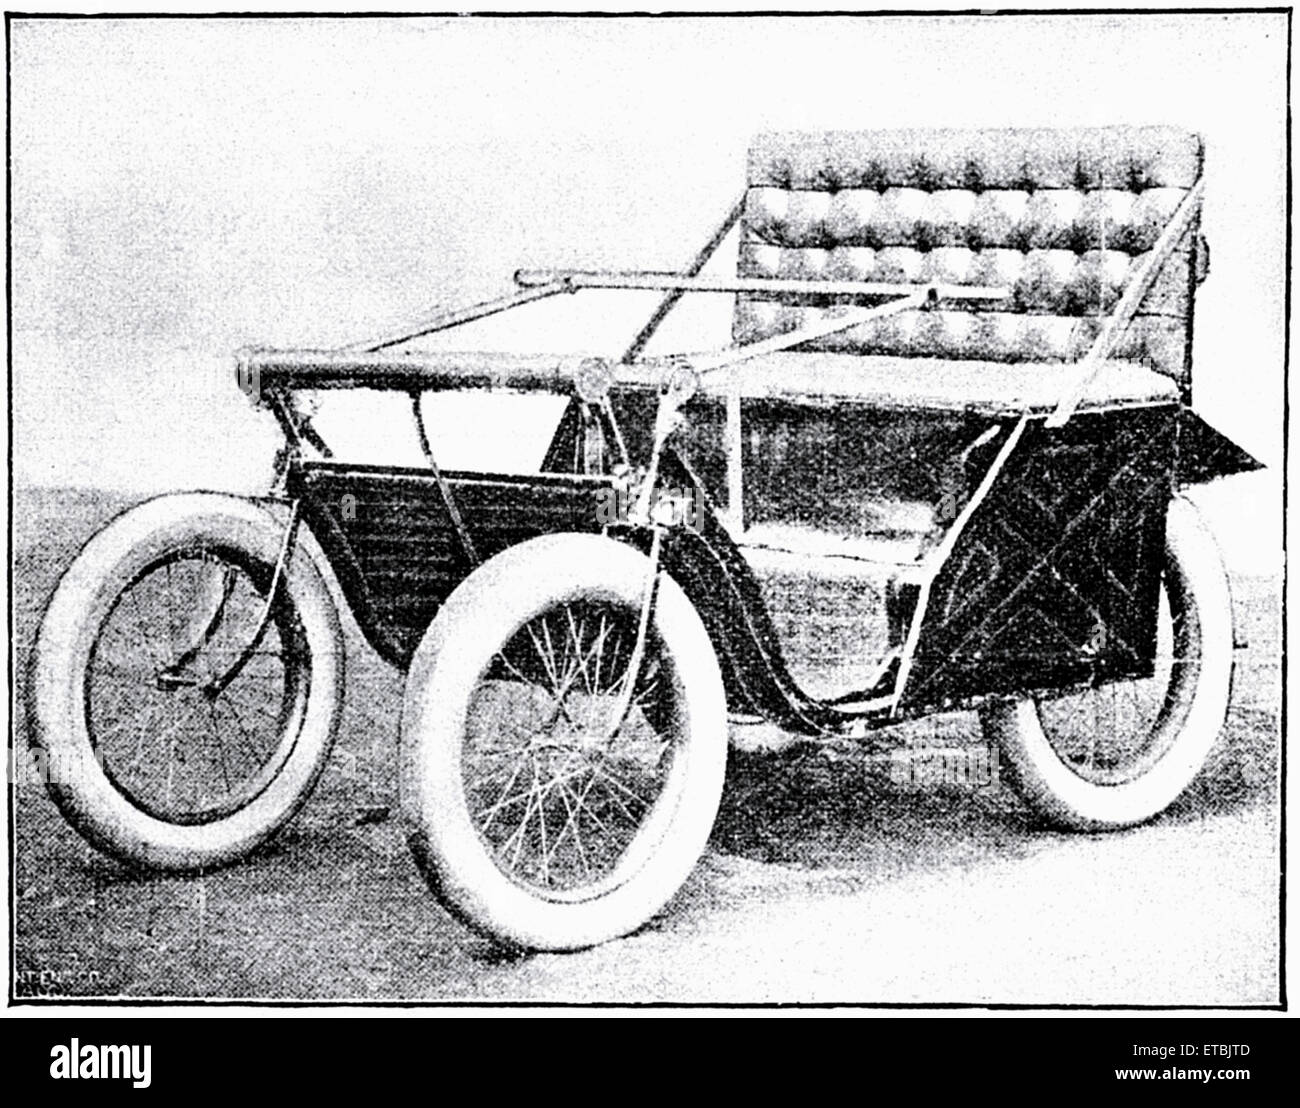 Victoria Motorette, Racine Motor Vehicle Company, circa 1895 - Stock Image